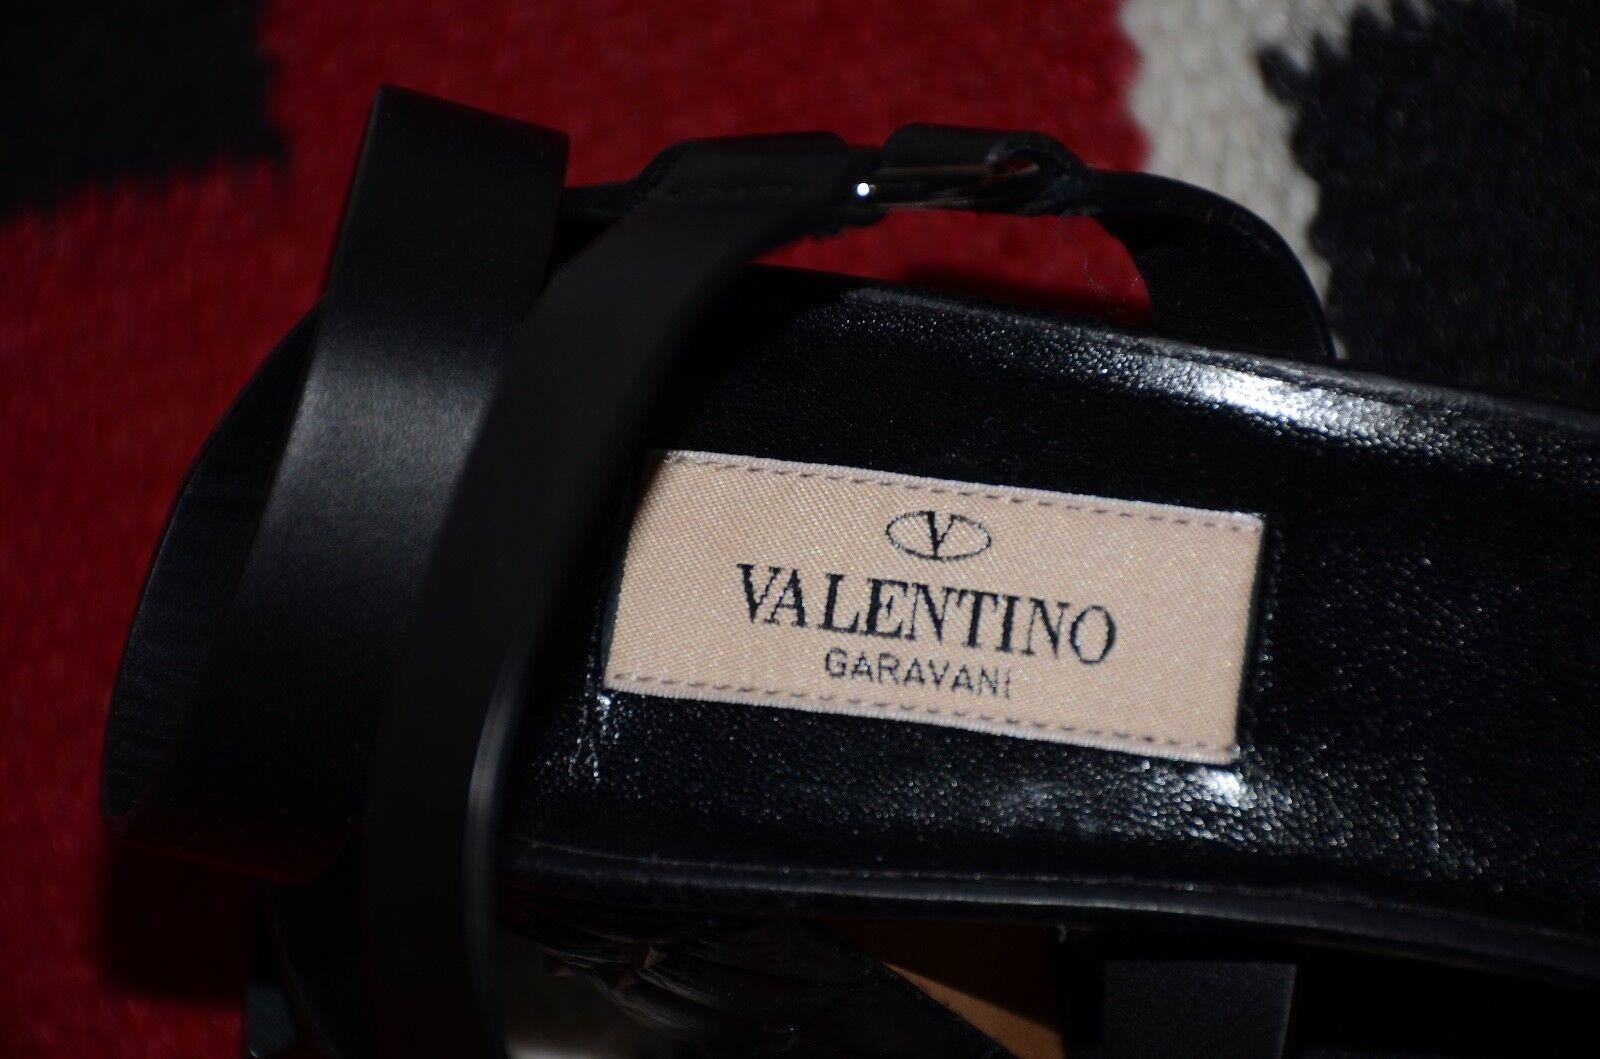 Valentino Valentino Valentino Garavani Made in  Leather Rockstud Spike Sports Sandals 39.5 a0bdf7